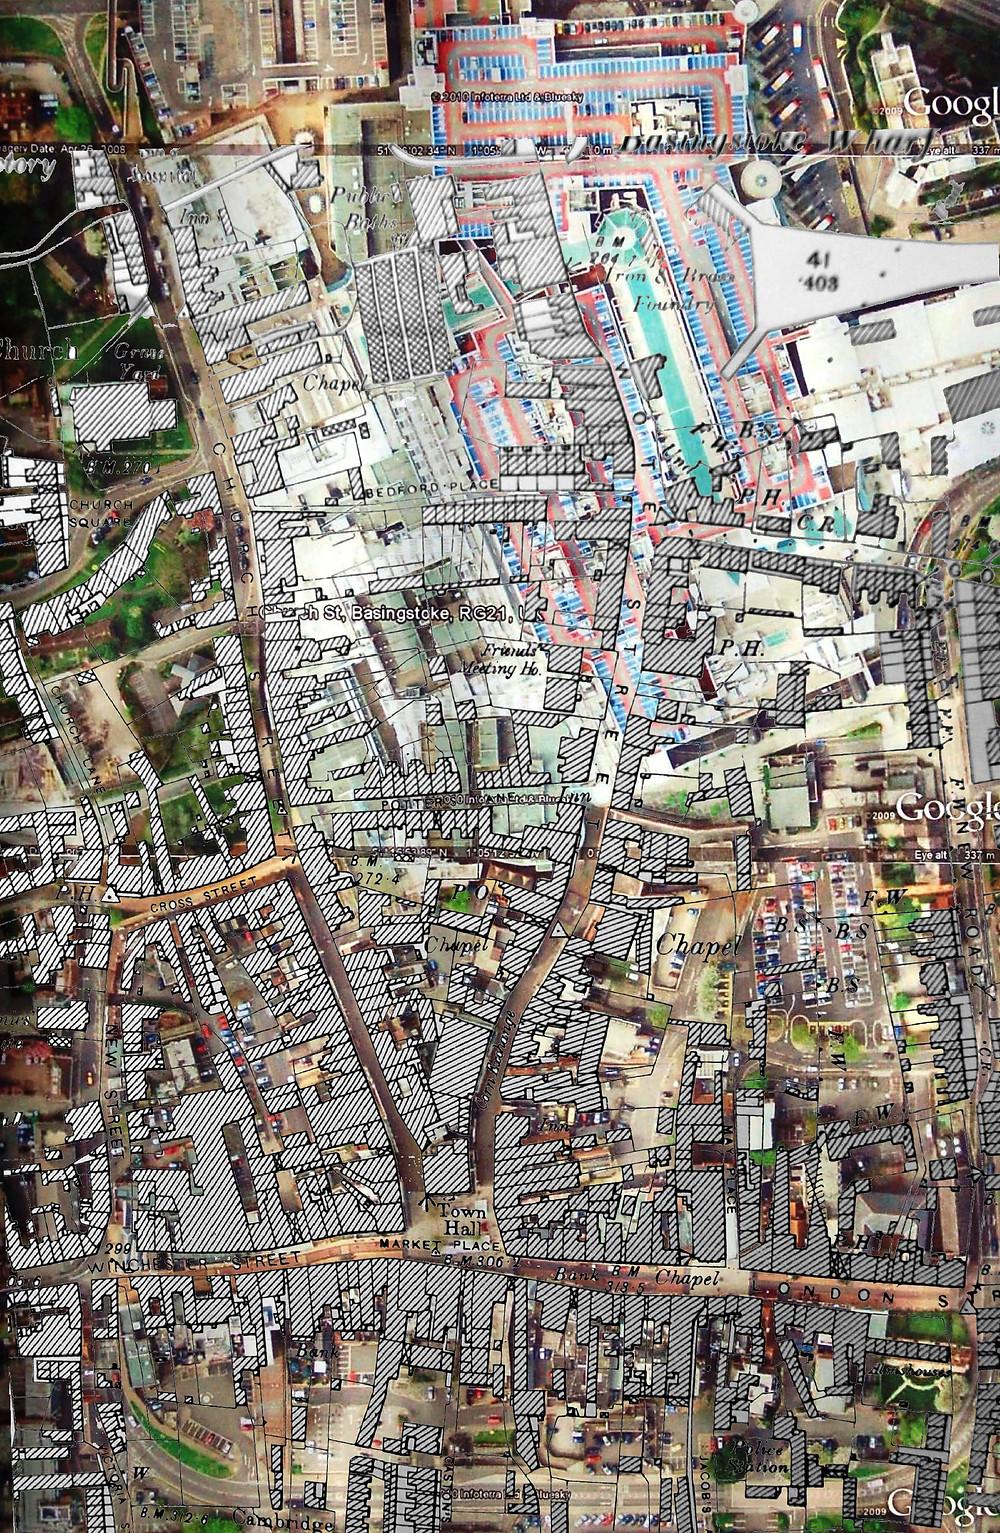 Aerial photo of Basingstoke (UK) town, overlaid by a 1910 map of Edwardian Basingstoke